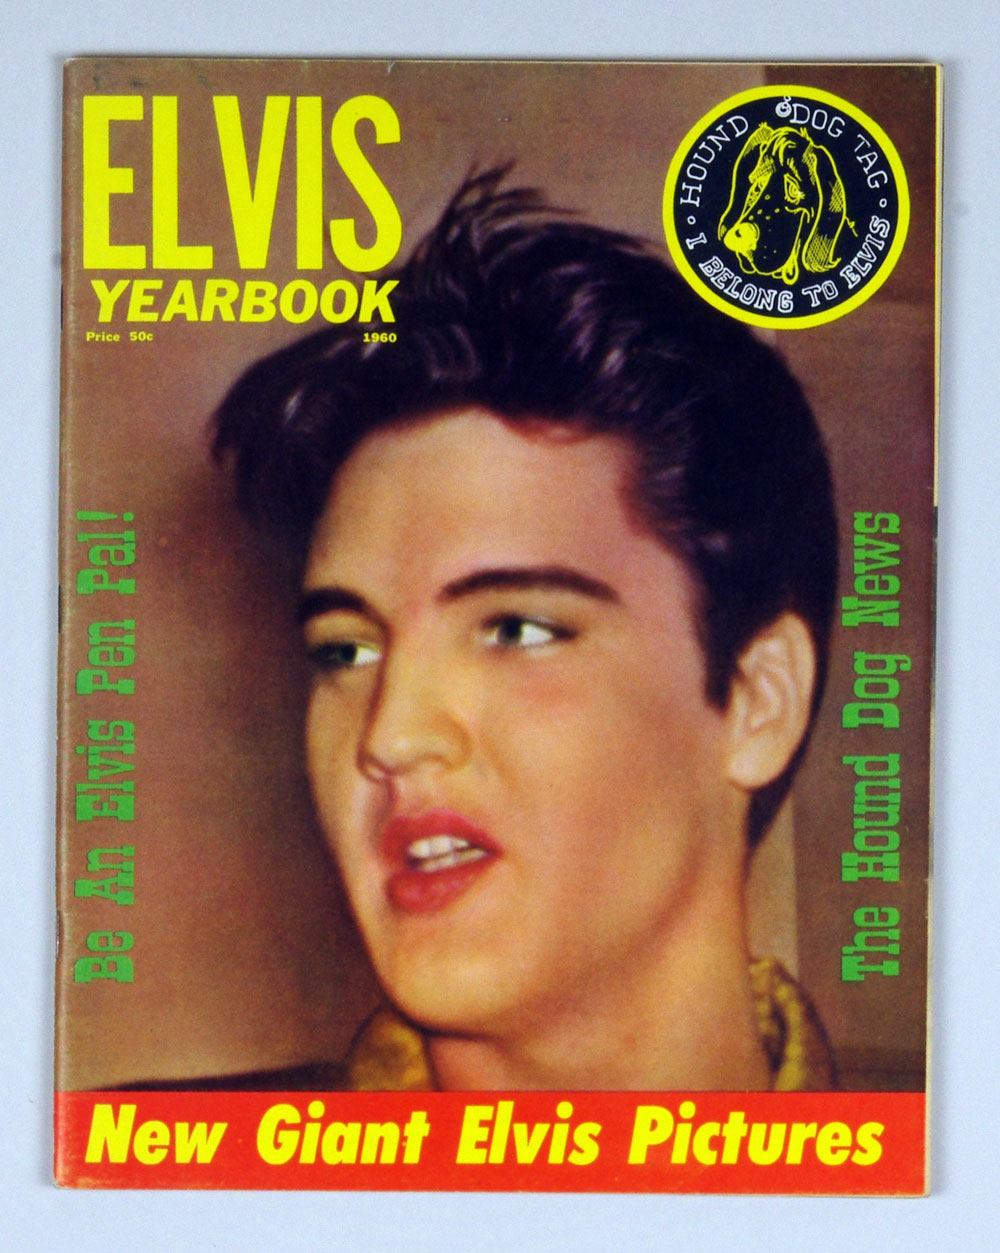 Elvis Presley Yearbook Hound Dog Tag Published 1960